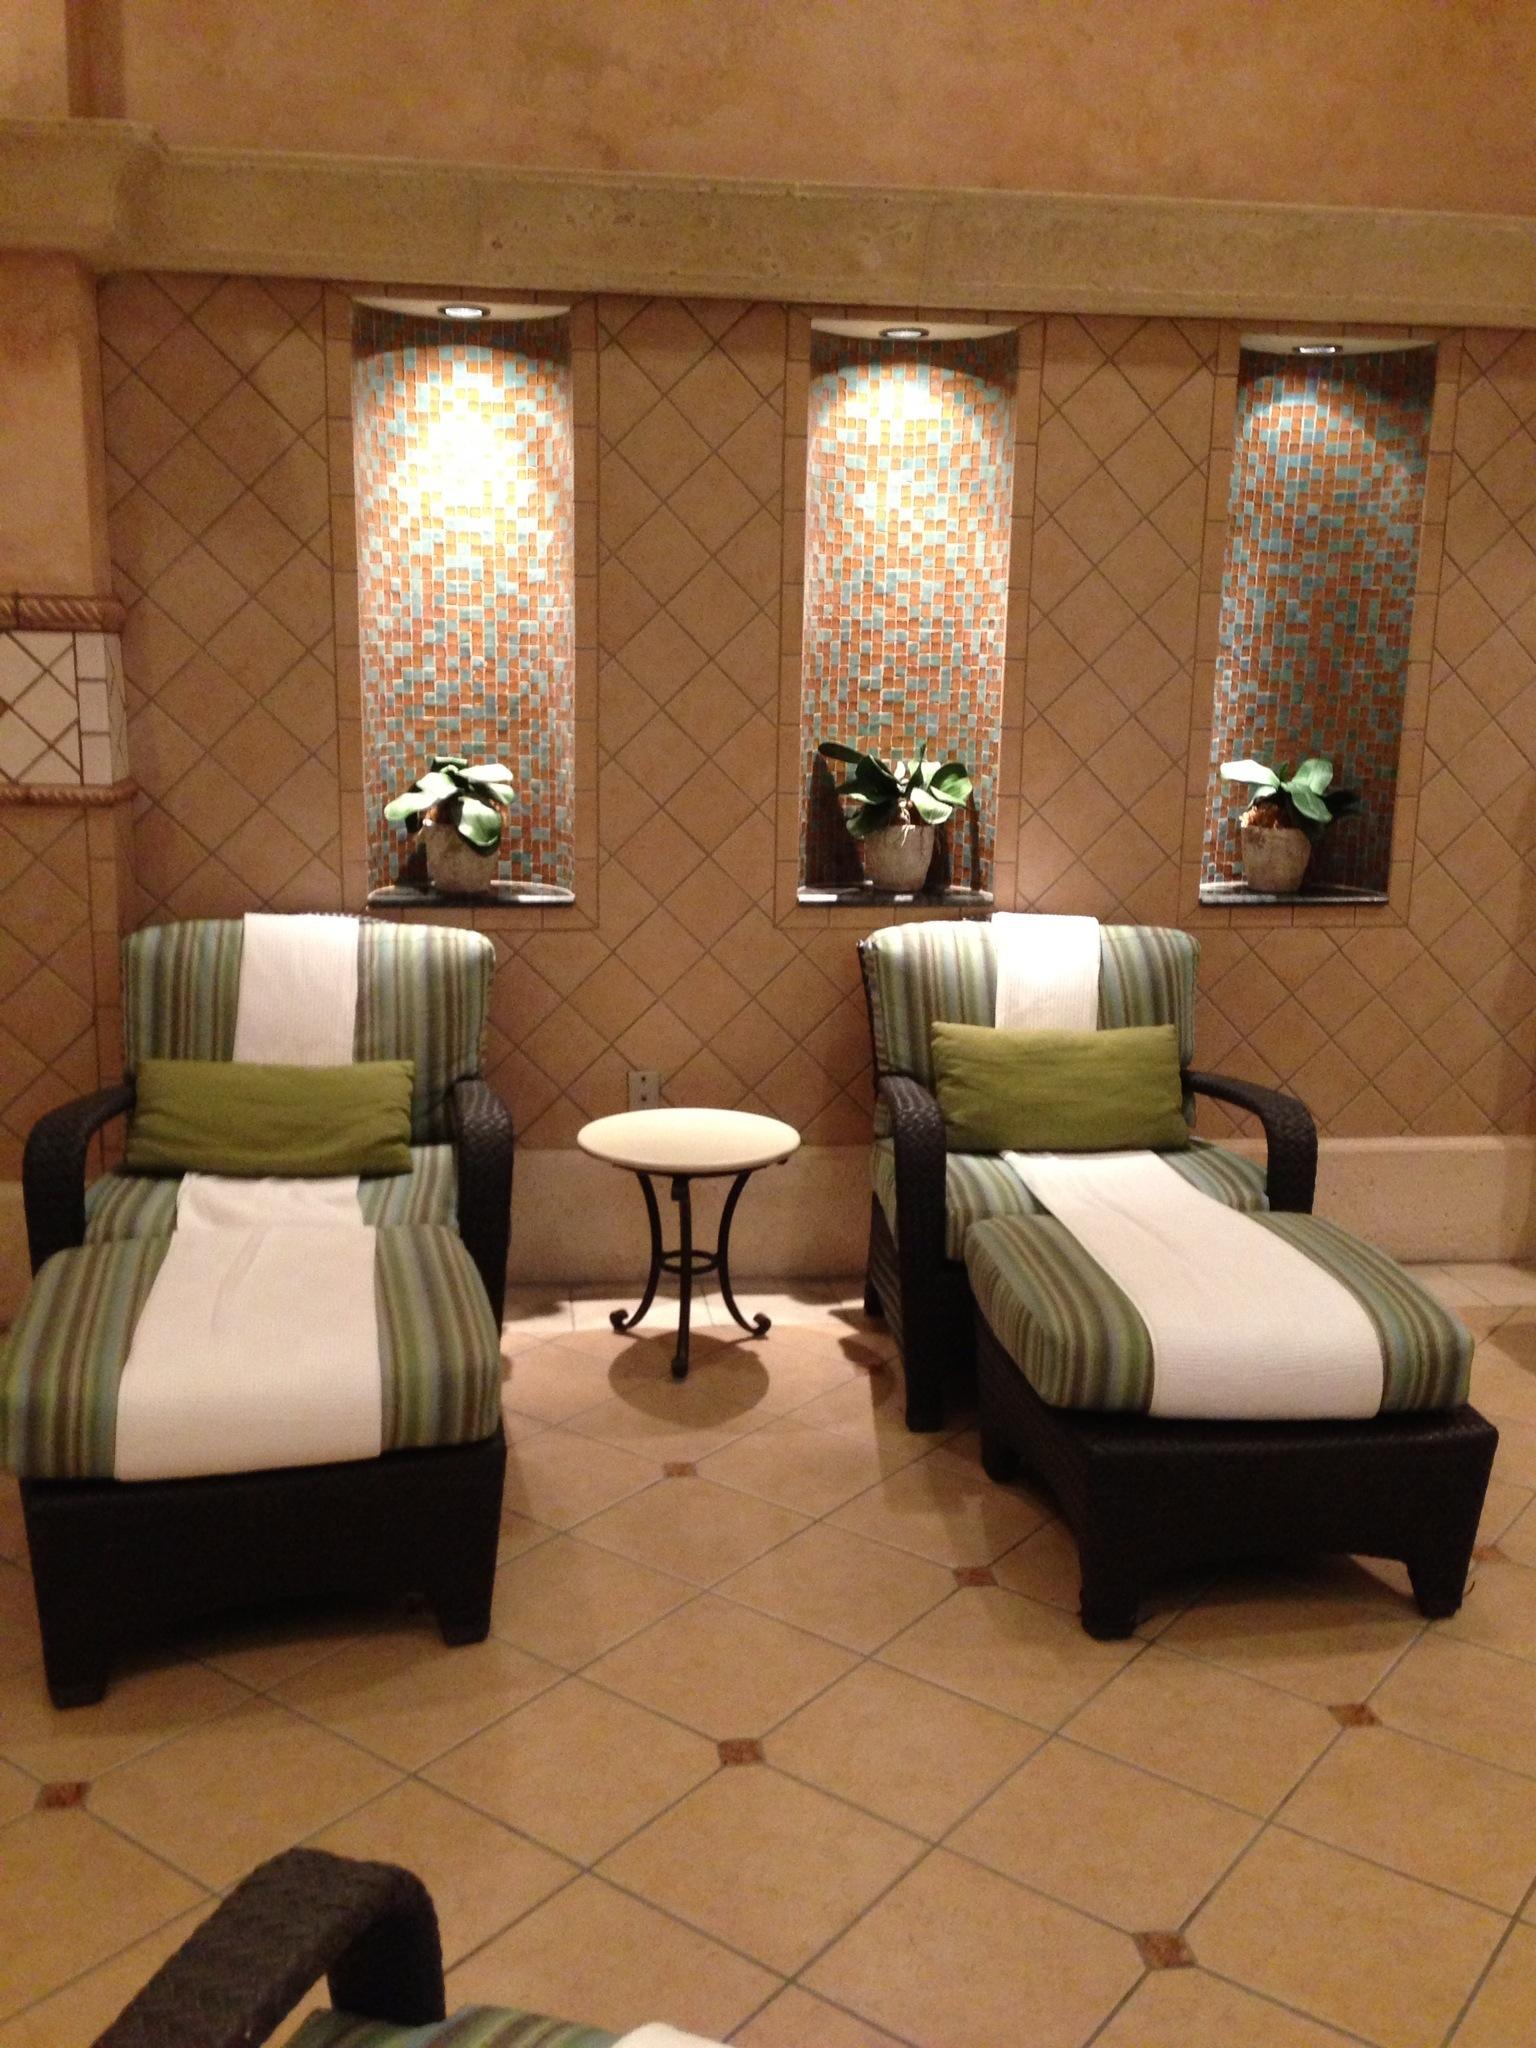 Savoring Sarasota A Mini Spa and Culinary Retreat at The Ritz